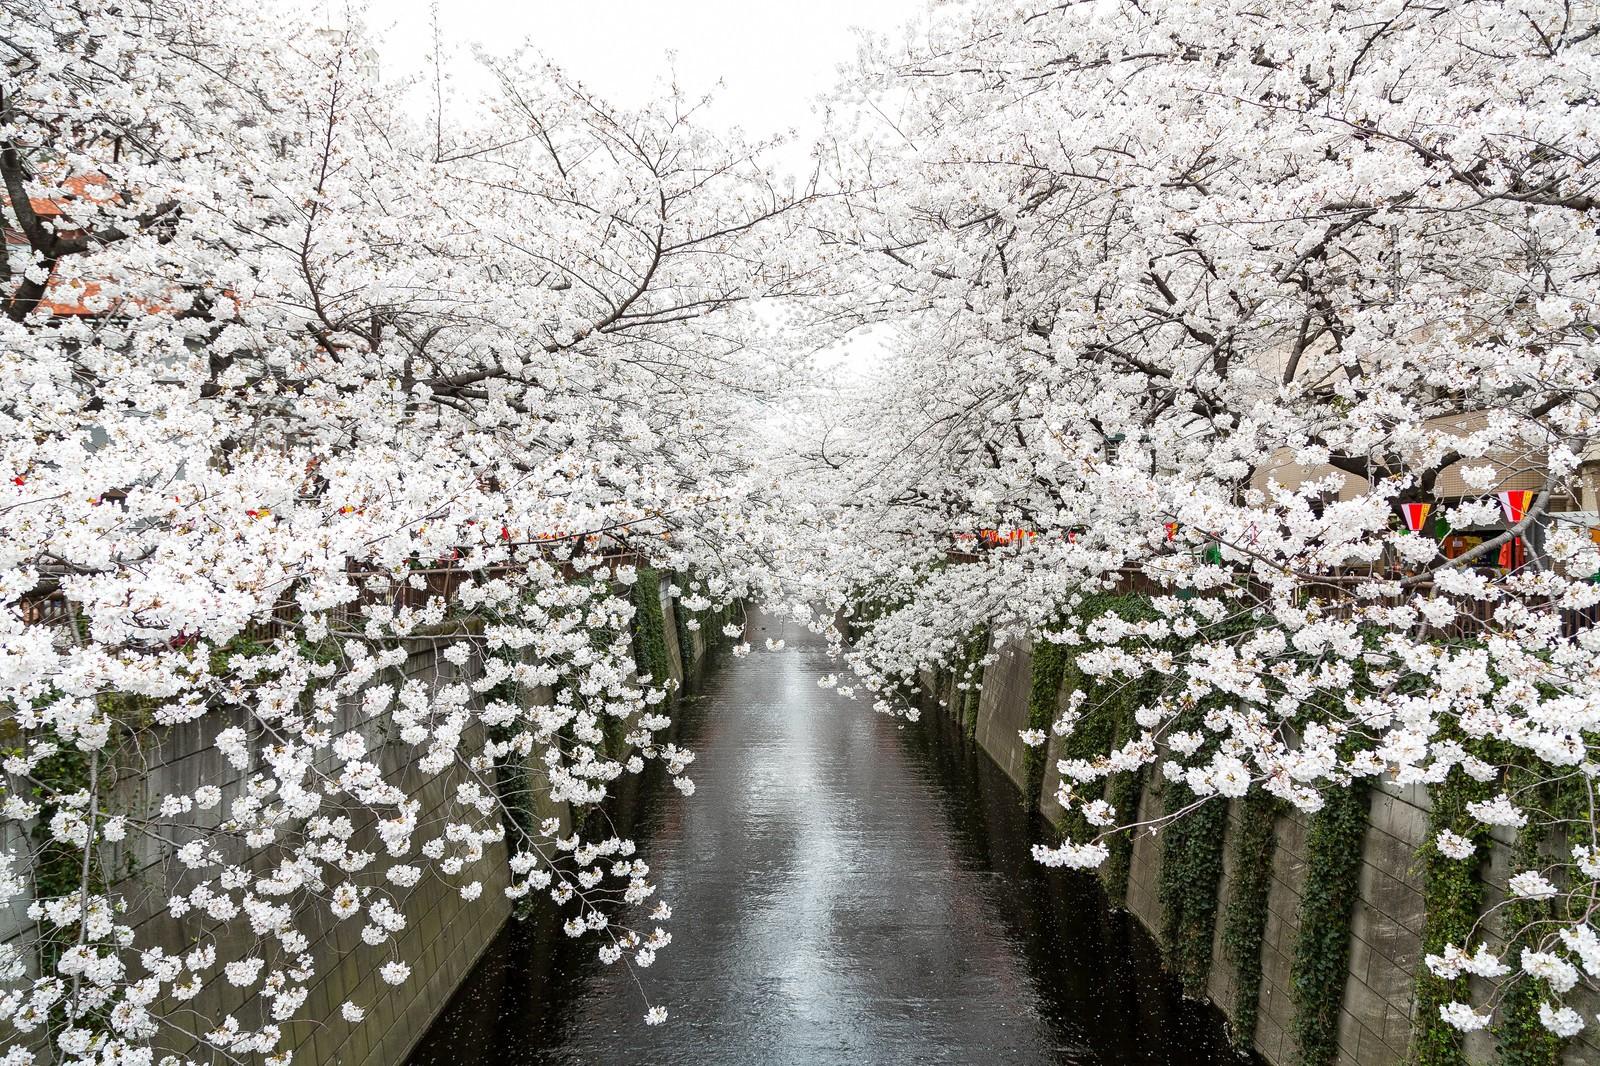 cherry blossom festival 2020 - HD1600×1066